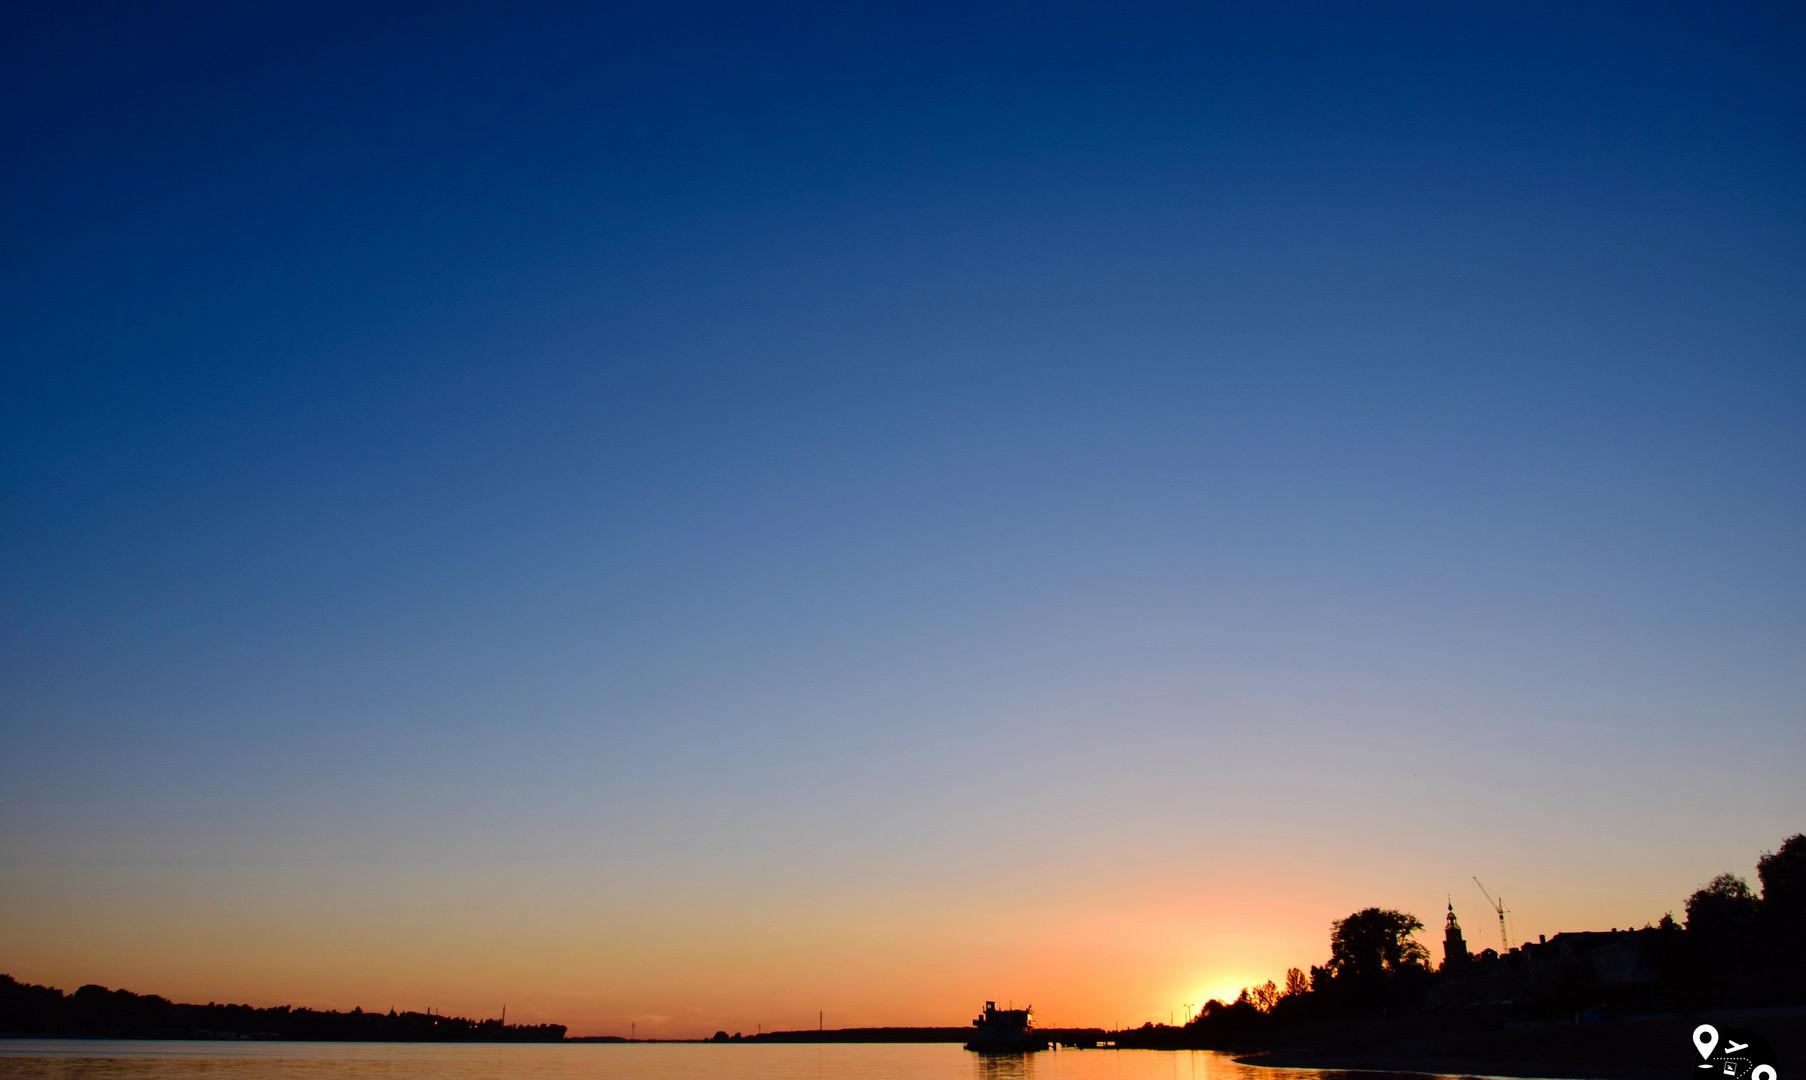 Sunset on the Volga River, Kostroma